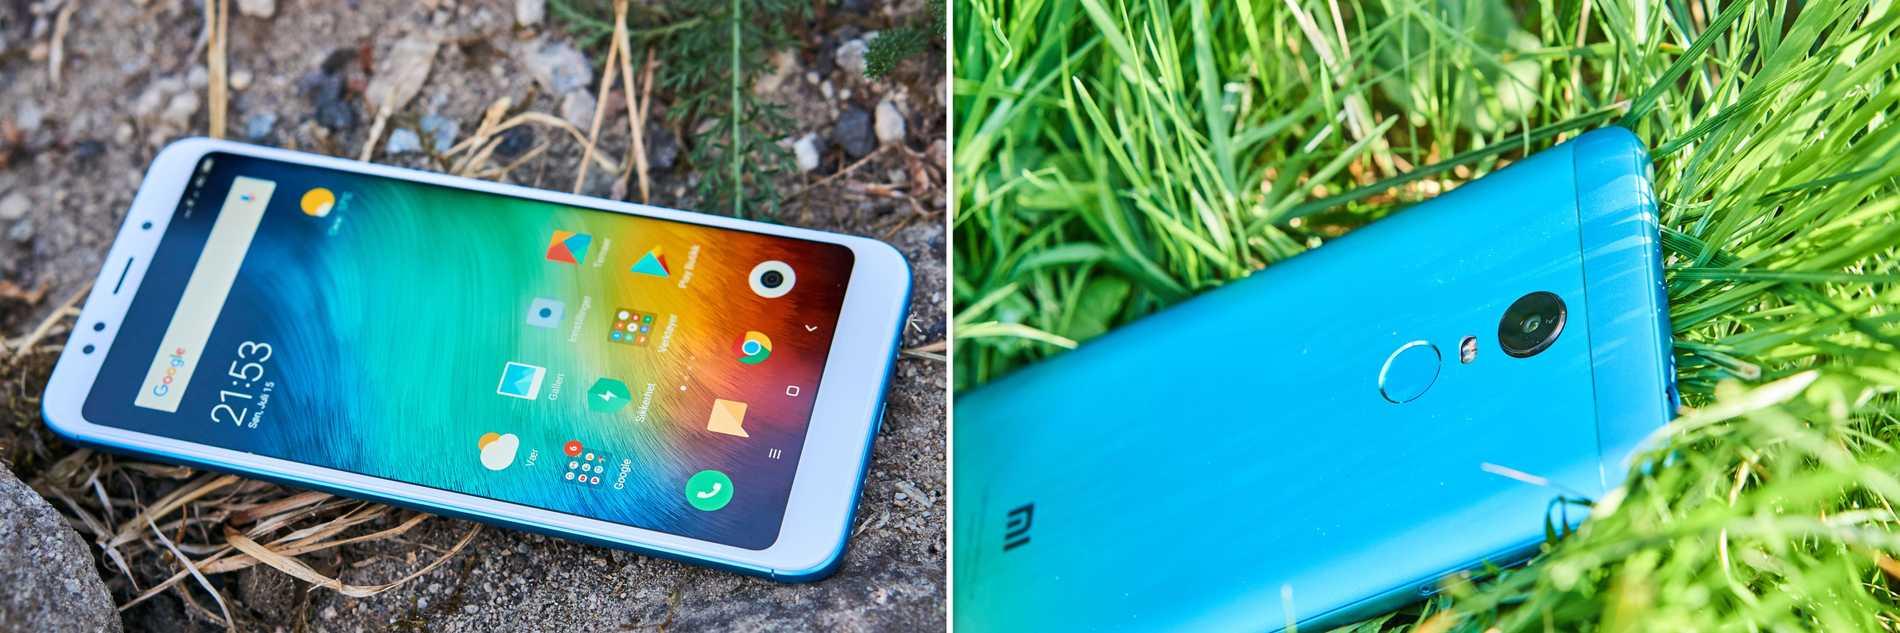 Xiaomi Redmi 5 Plus ser modern och fräck ut.